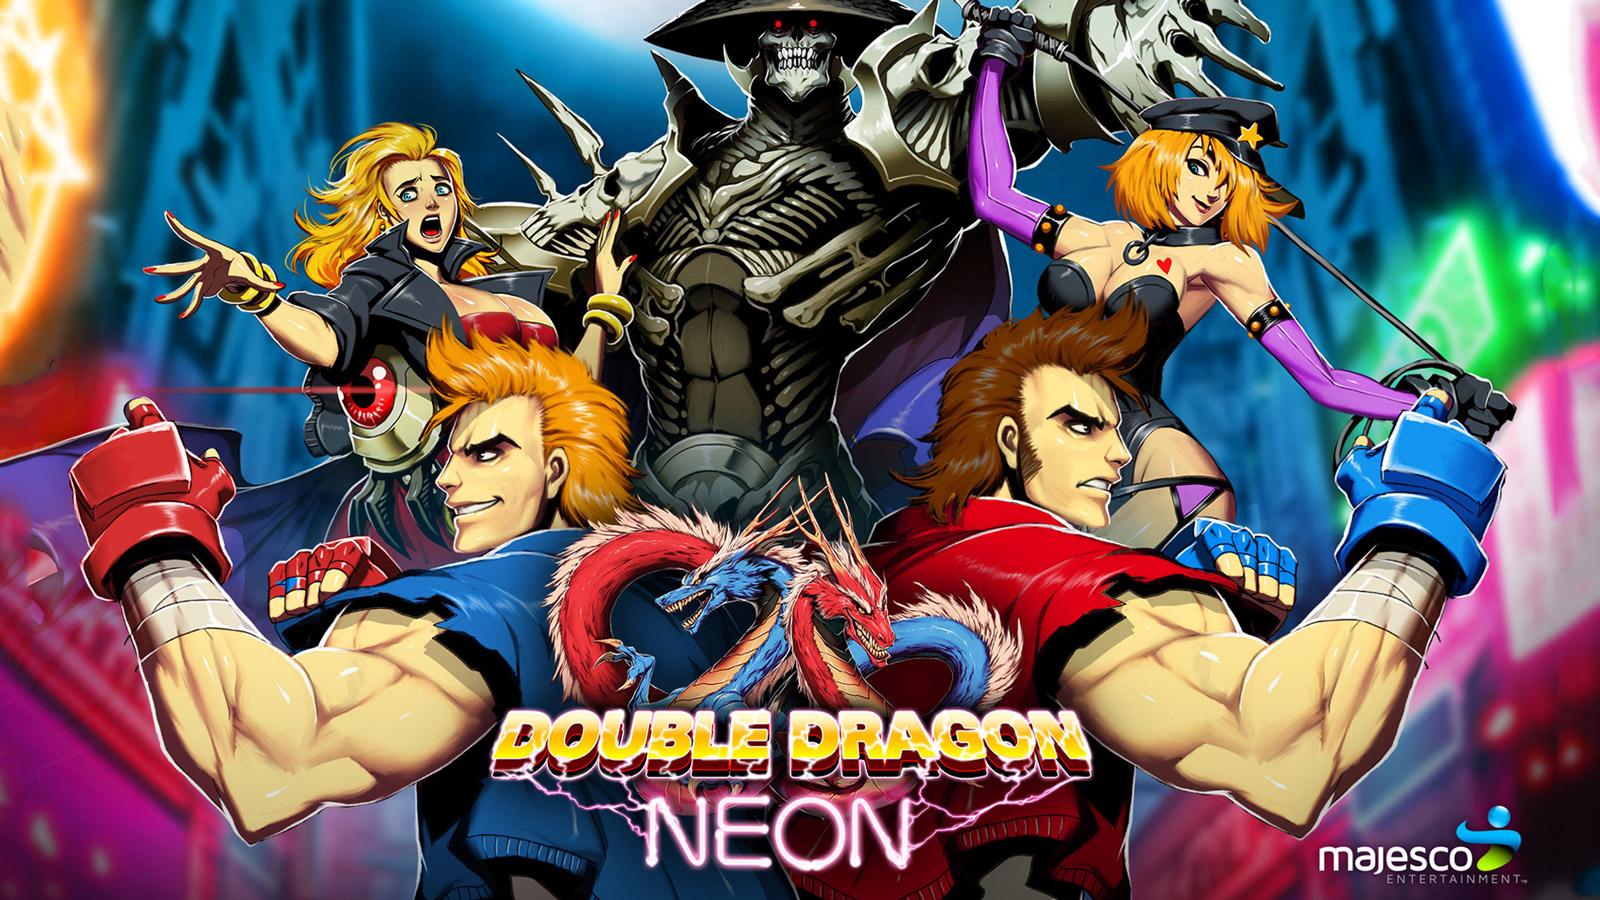 Double Dragon Neon Wallpaper in 1600x900